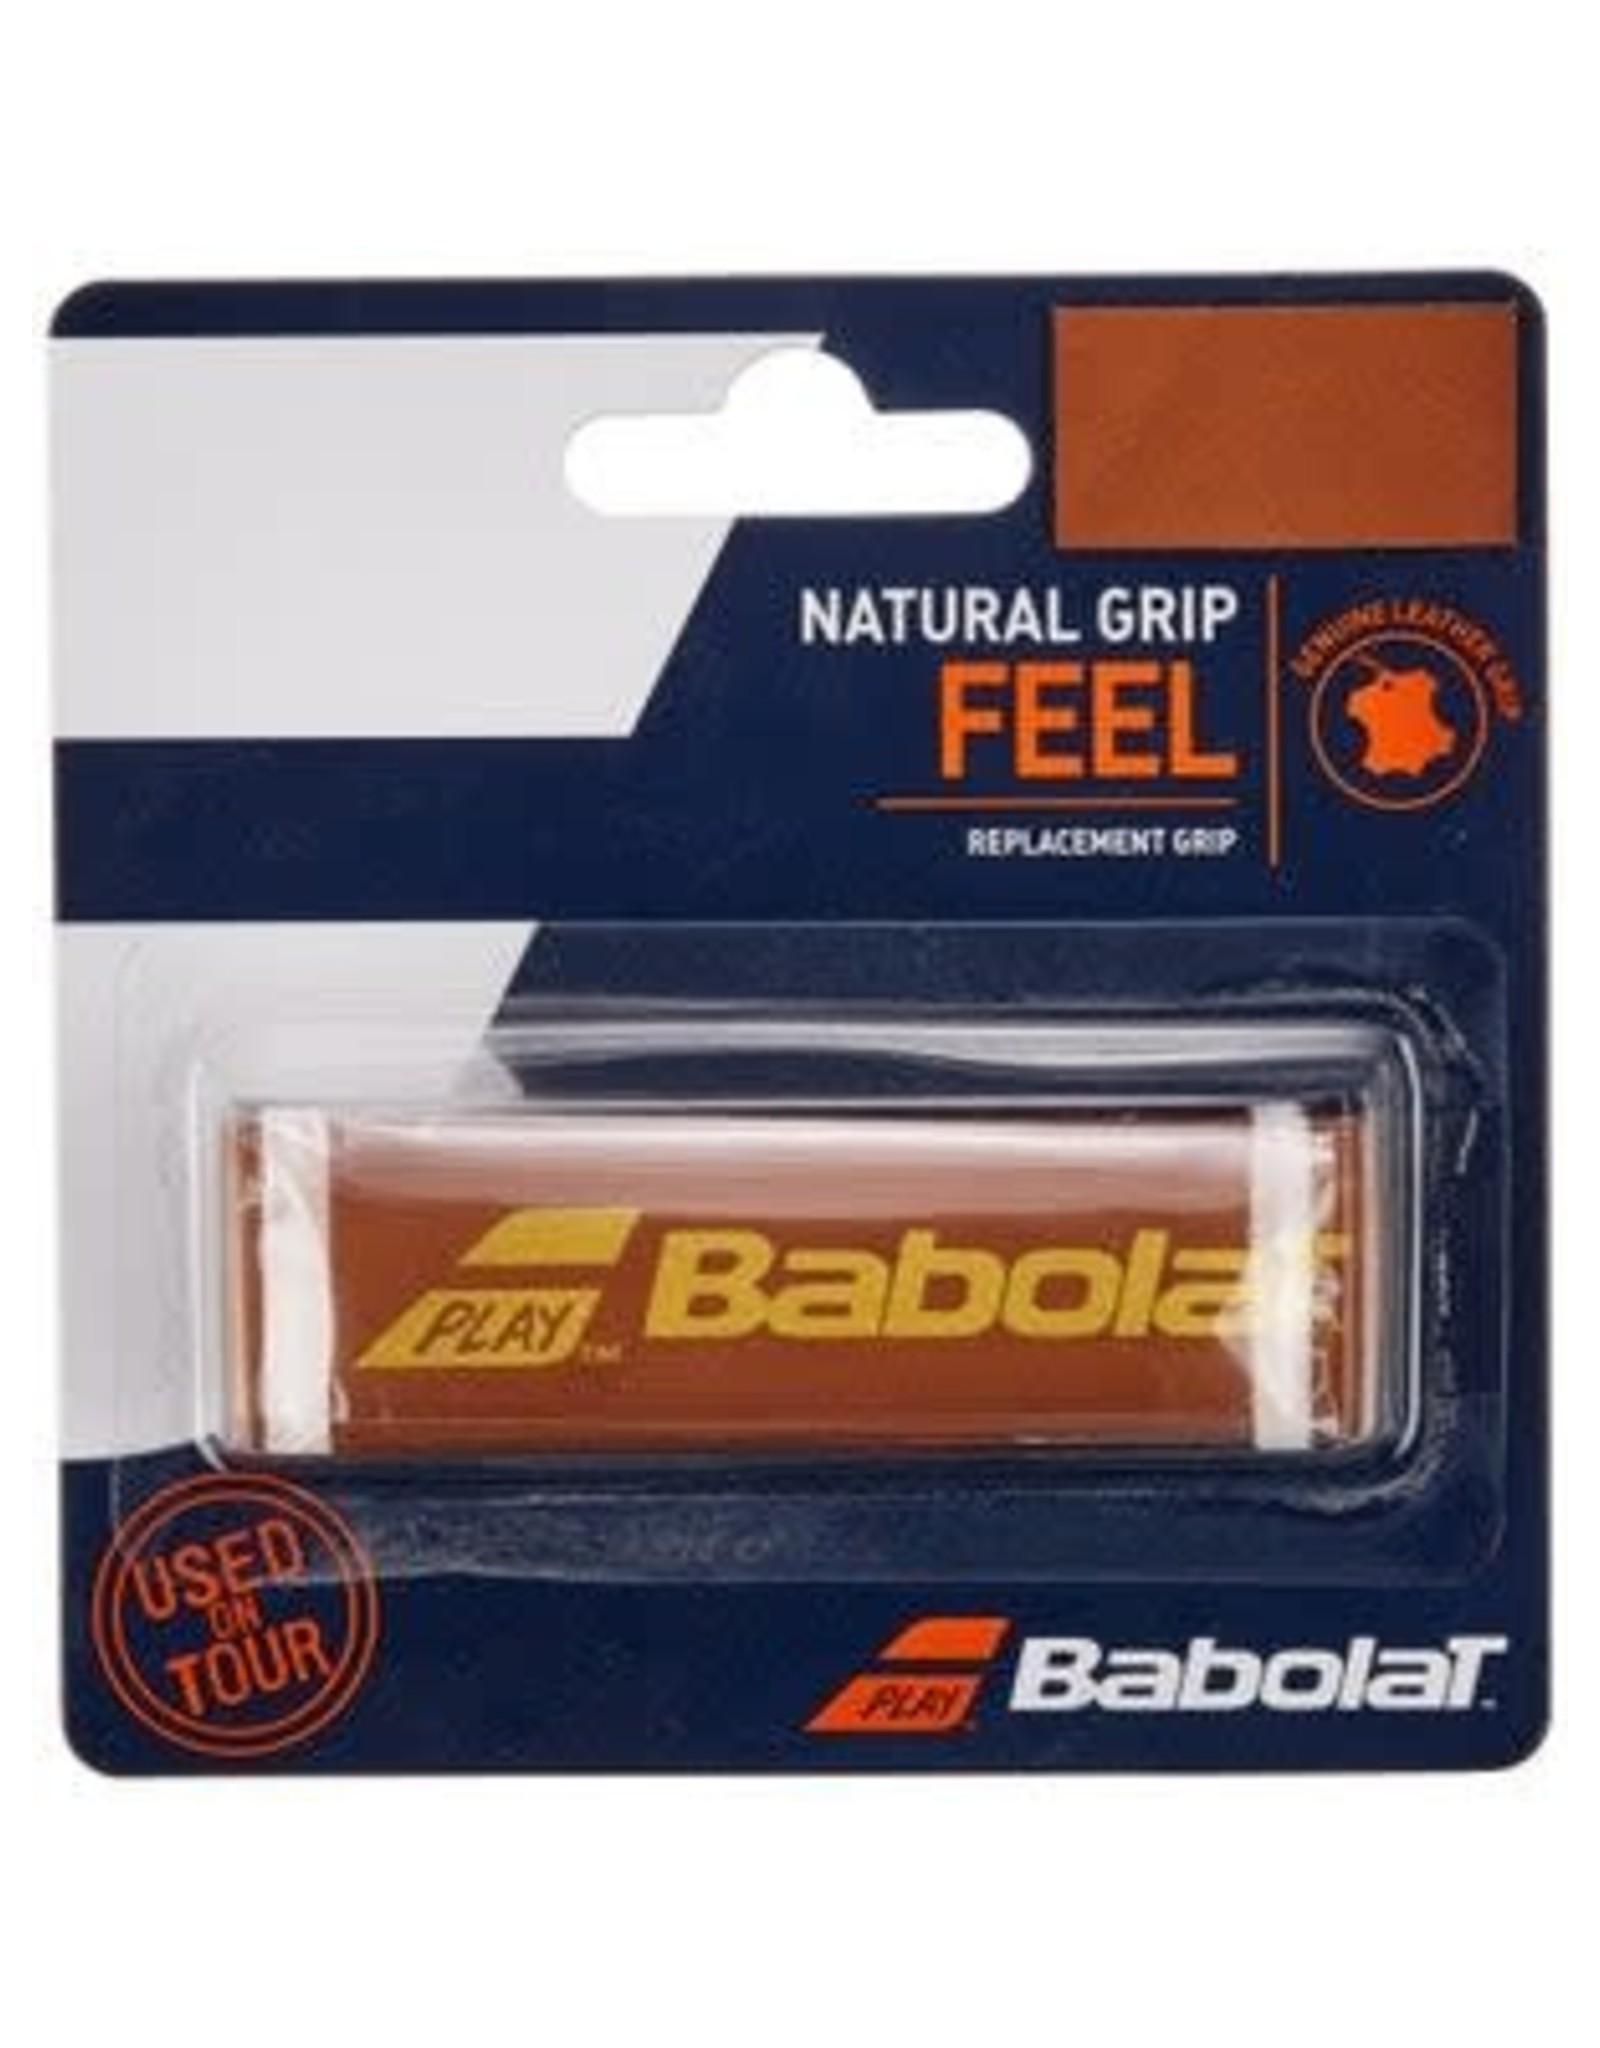 Babolat Babolat Natural Grip Feel Brown Replacement Grip